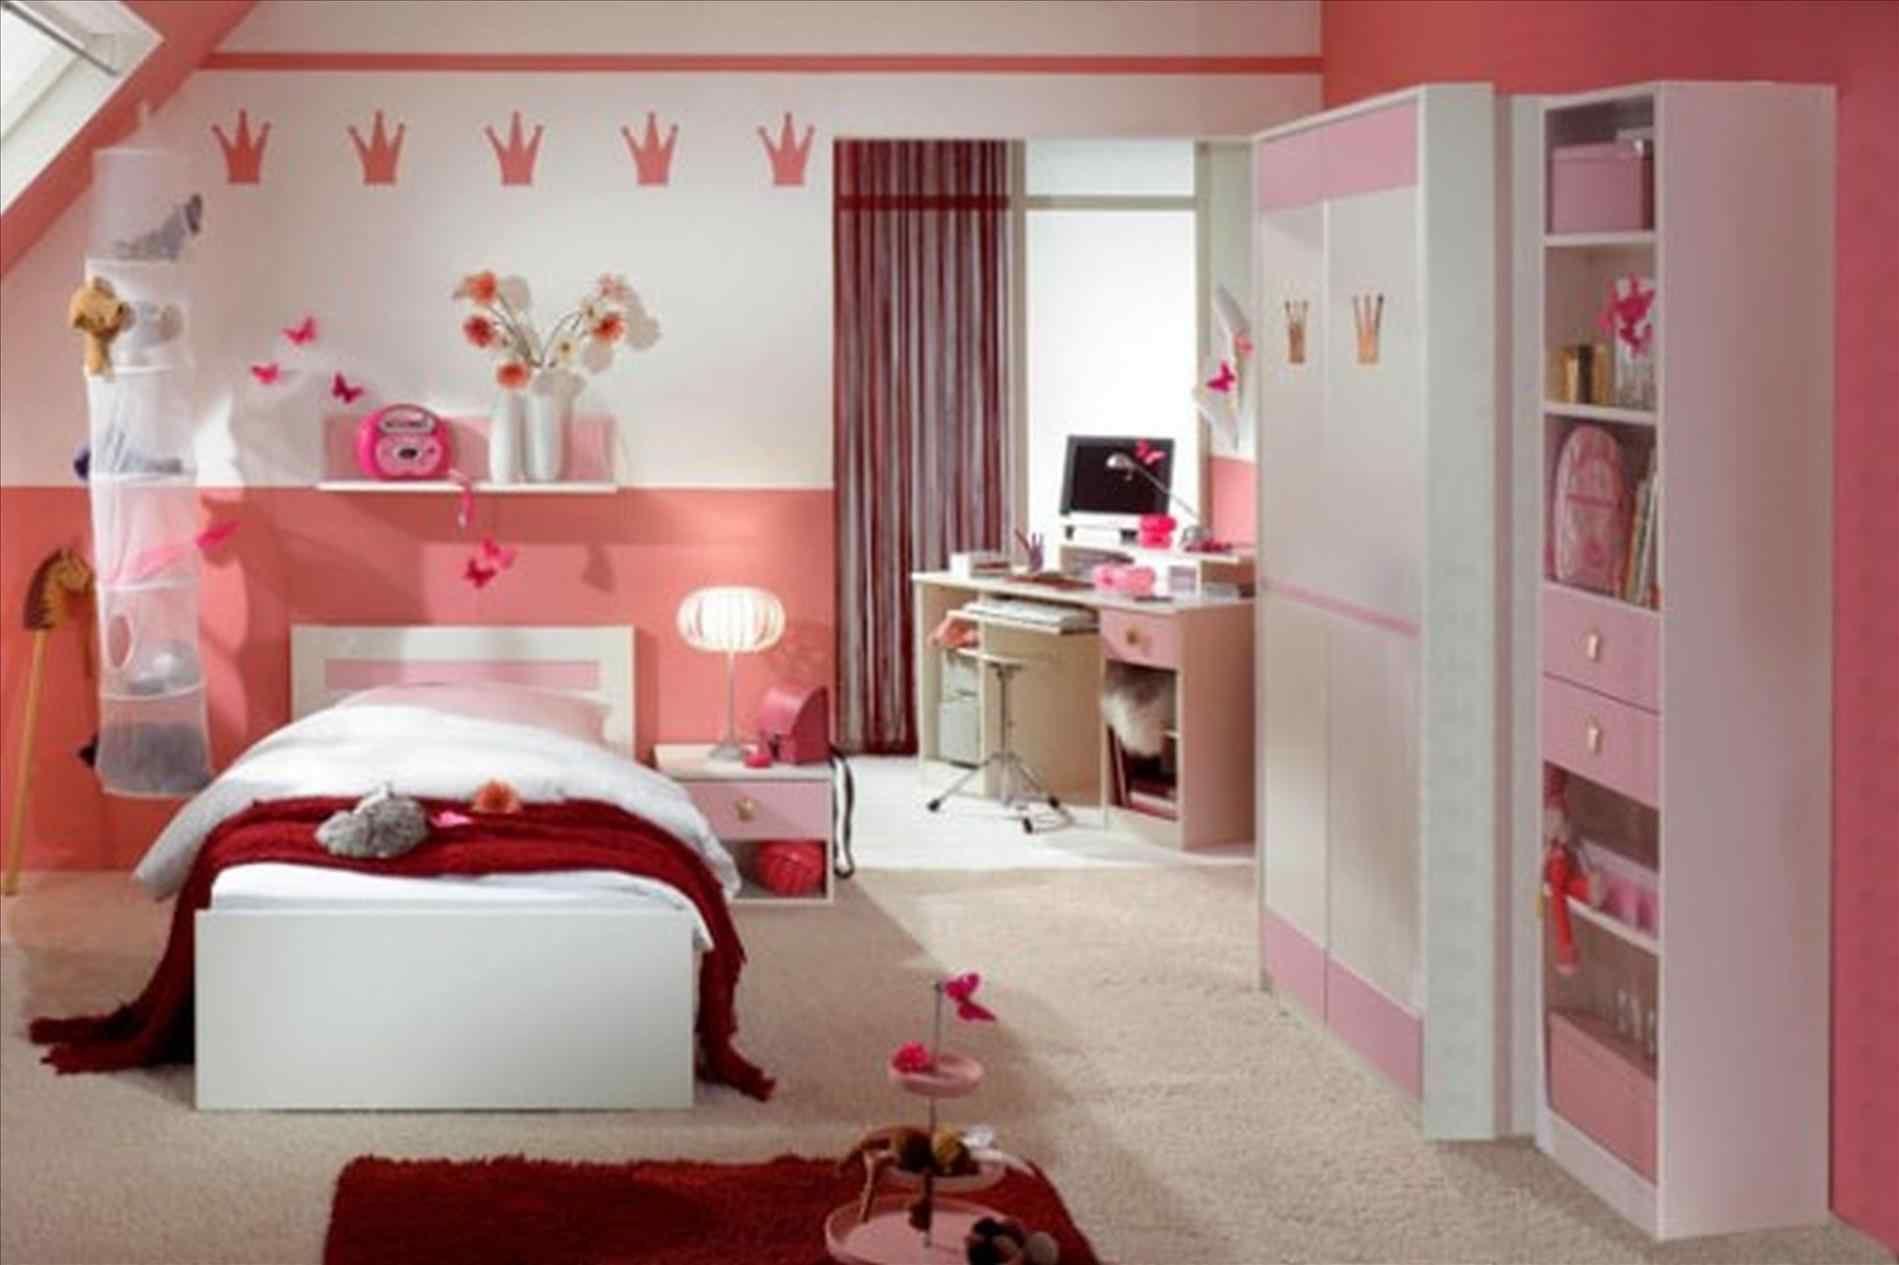 15 Beautiful Tween Girl Bedroom Ideas For Small Rooms Breakpr Simple Girls Bedroom Small Room Design Small Rooms